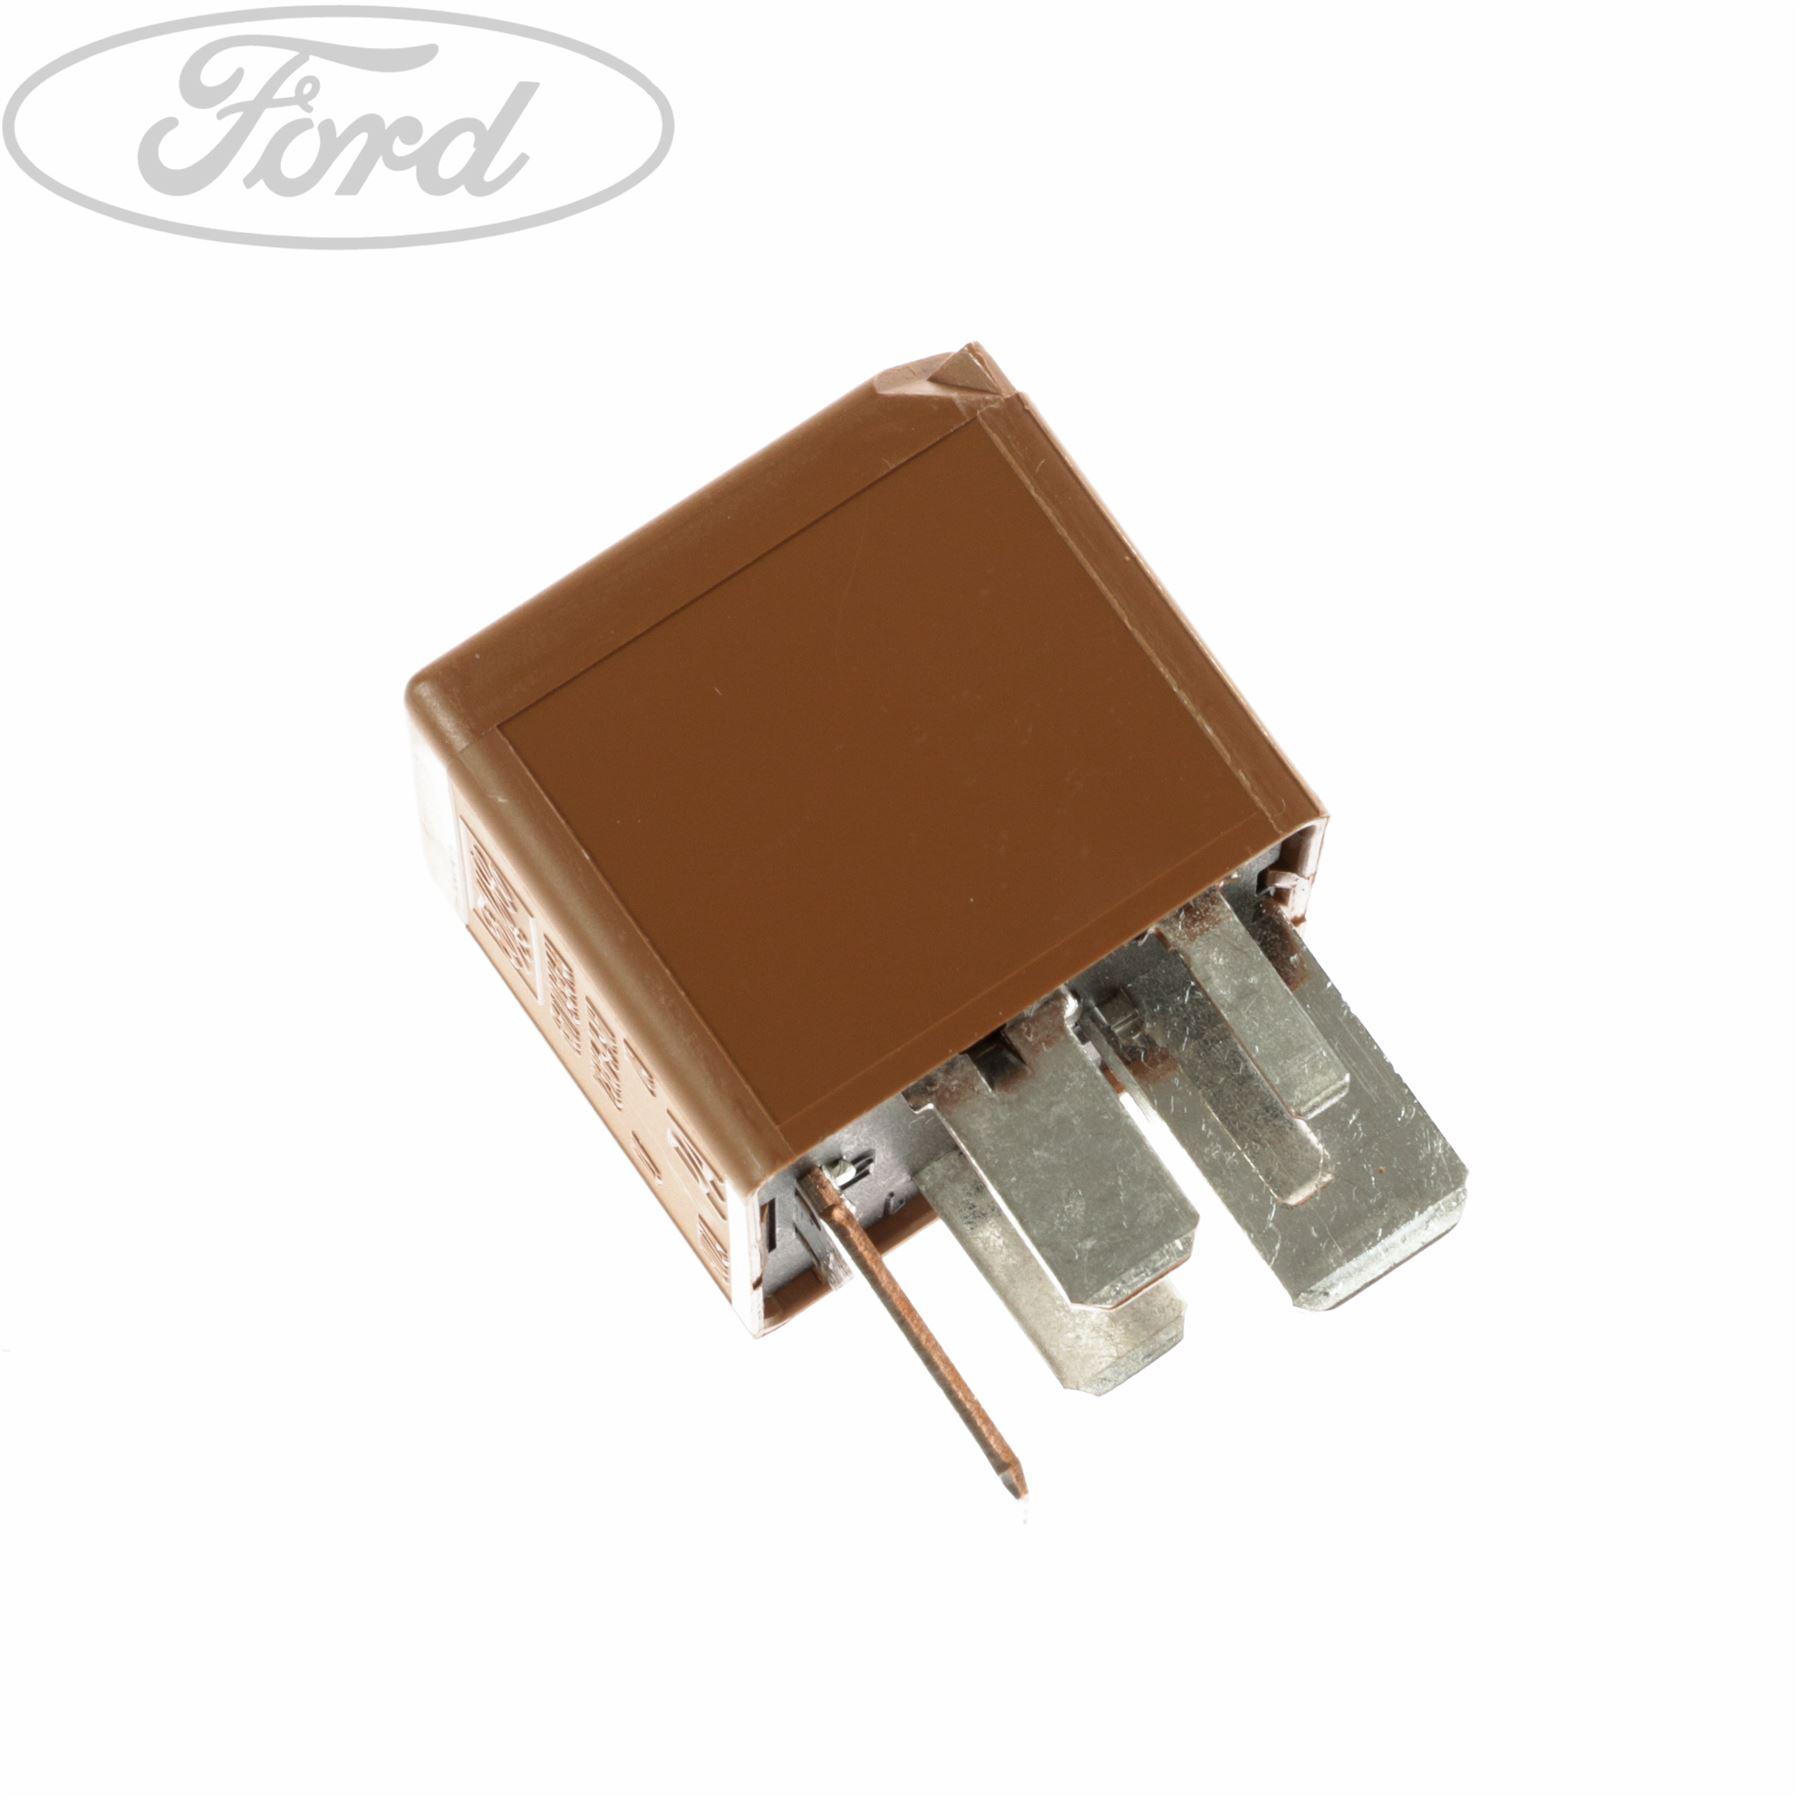 Genuine Ford Fiesta MK5 MK6 Heater Glow Plug Relay 5 Blade ...